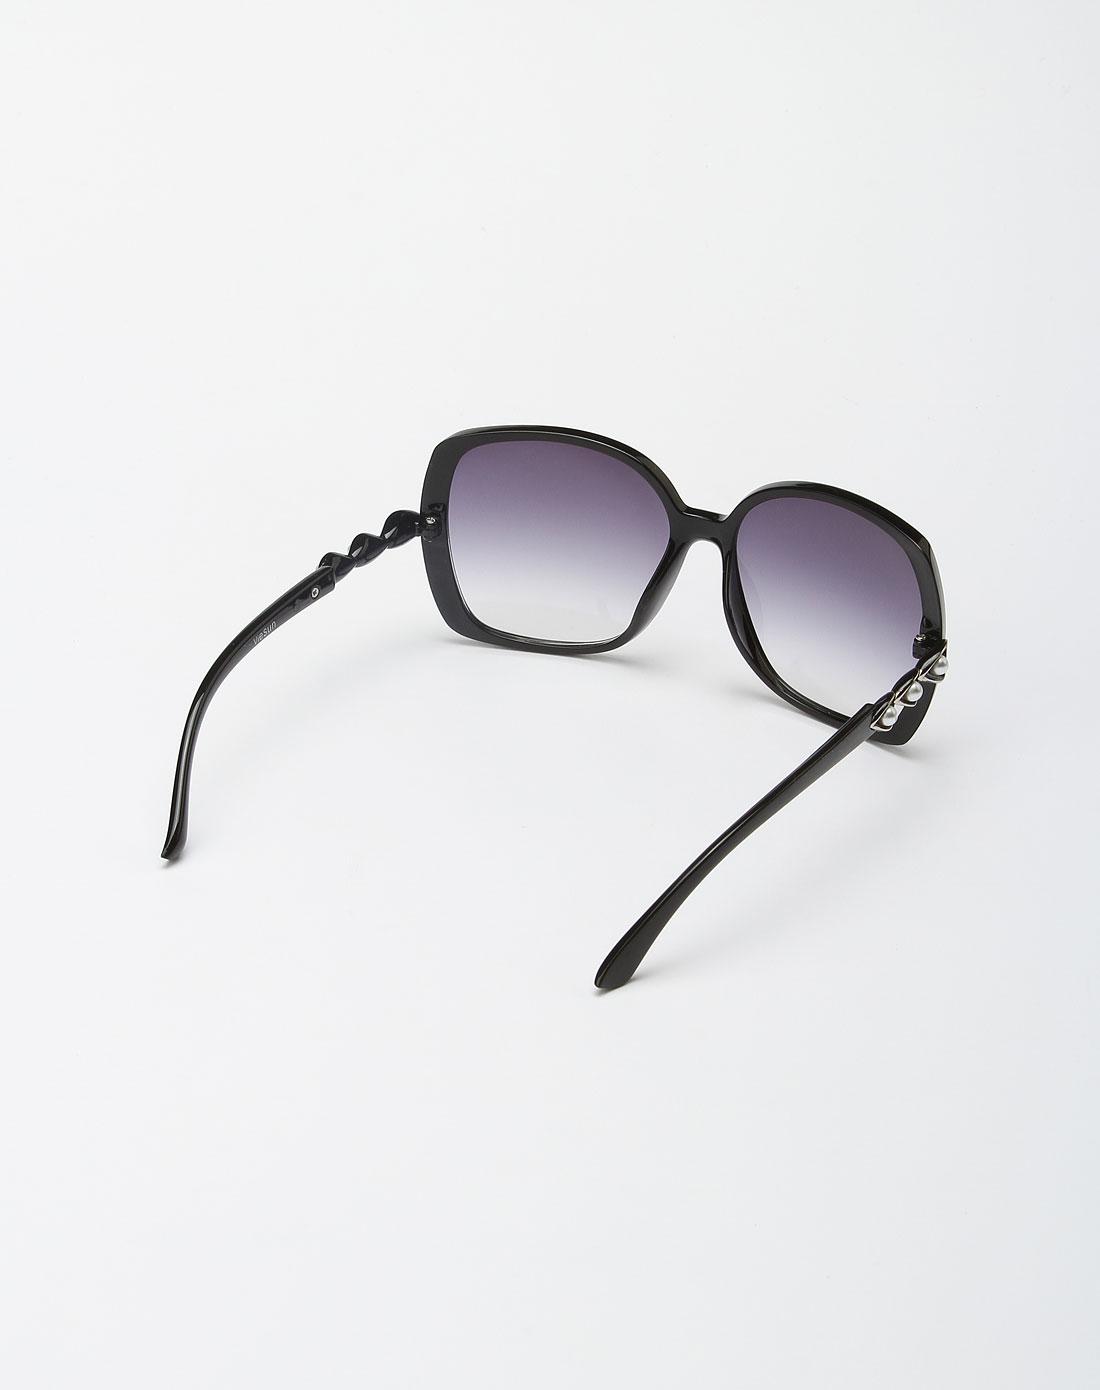 bailewei配件专场黑色欧式复古太阳眼镜7blw20129023